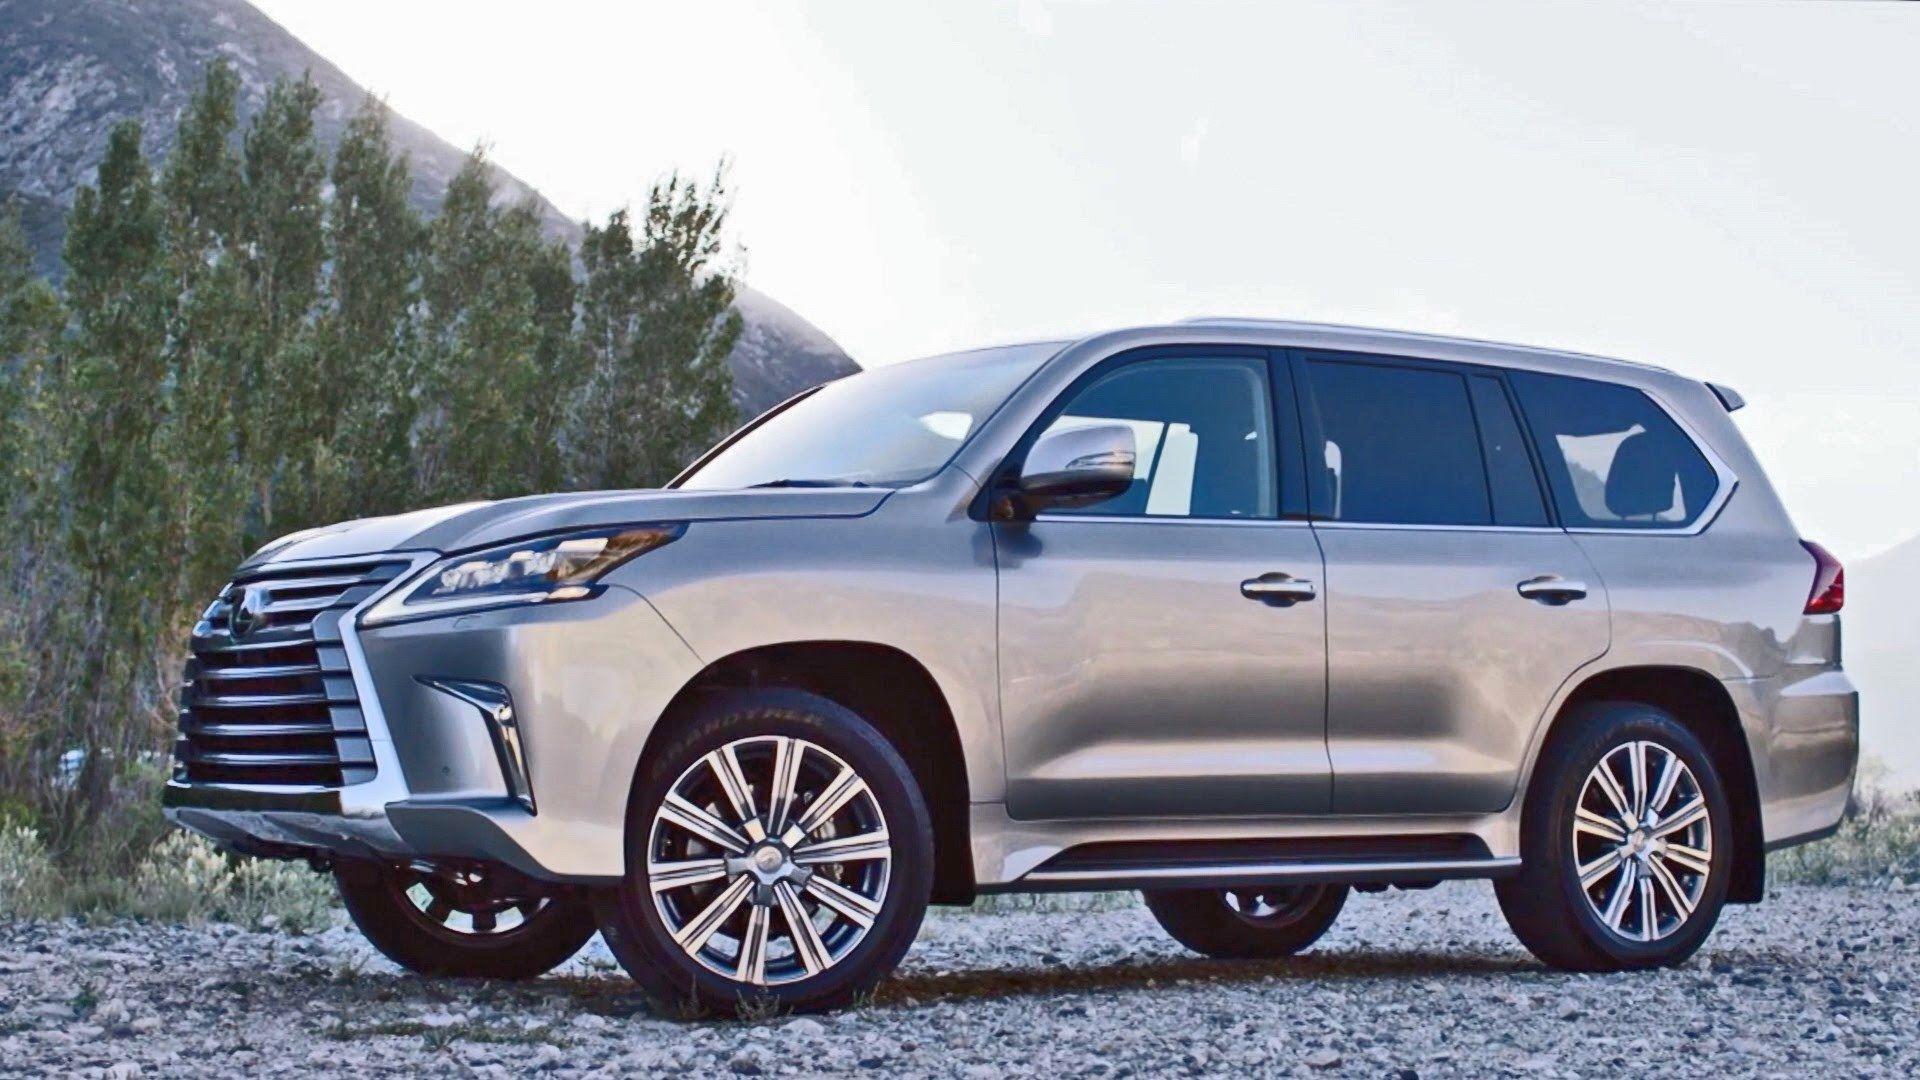 Toyota Land Cruiser Prado Redesigned For 2020 Lexus Gx Lexus Suv